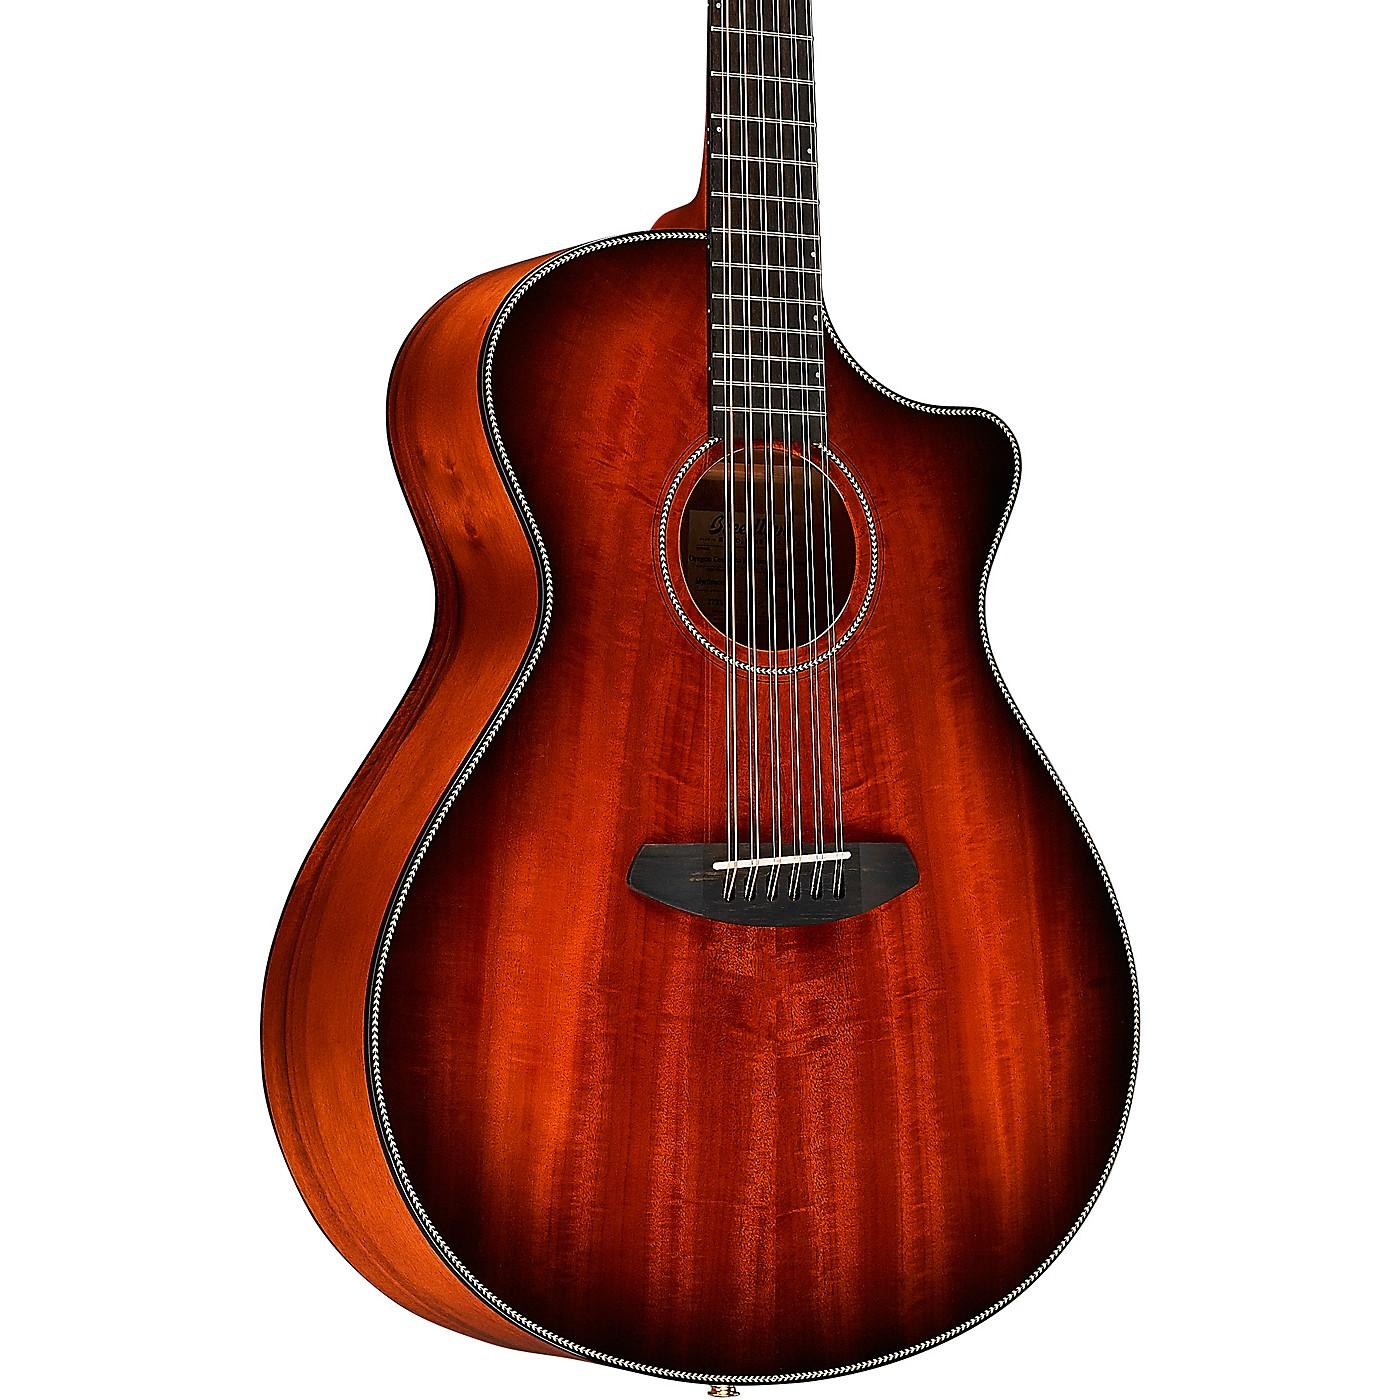 Breedlove Oregon Myrtlewood Concerto 12 String Acoustic-Electric Guitar thumbnail